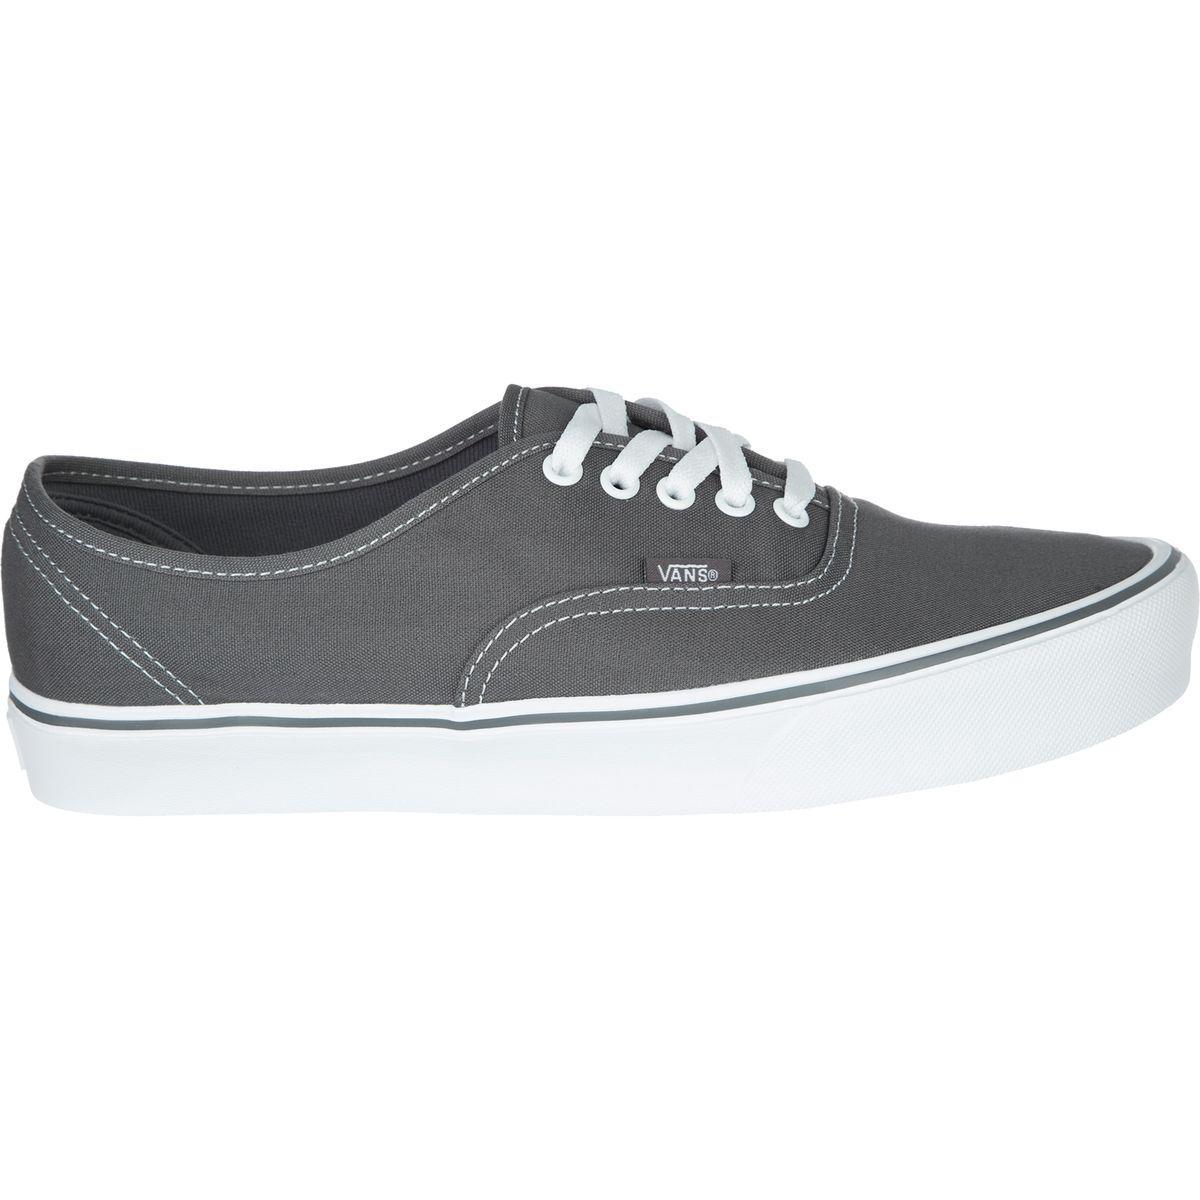 Vans. Men's Authentic Lite Shoe